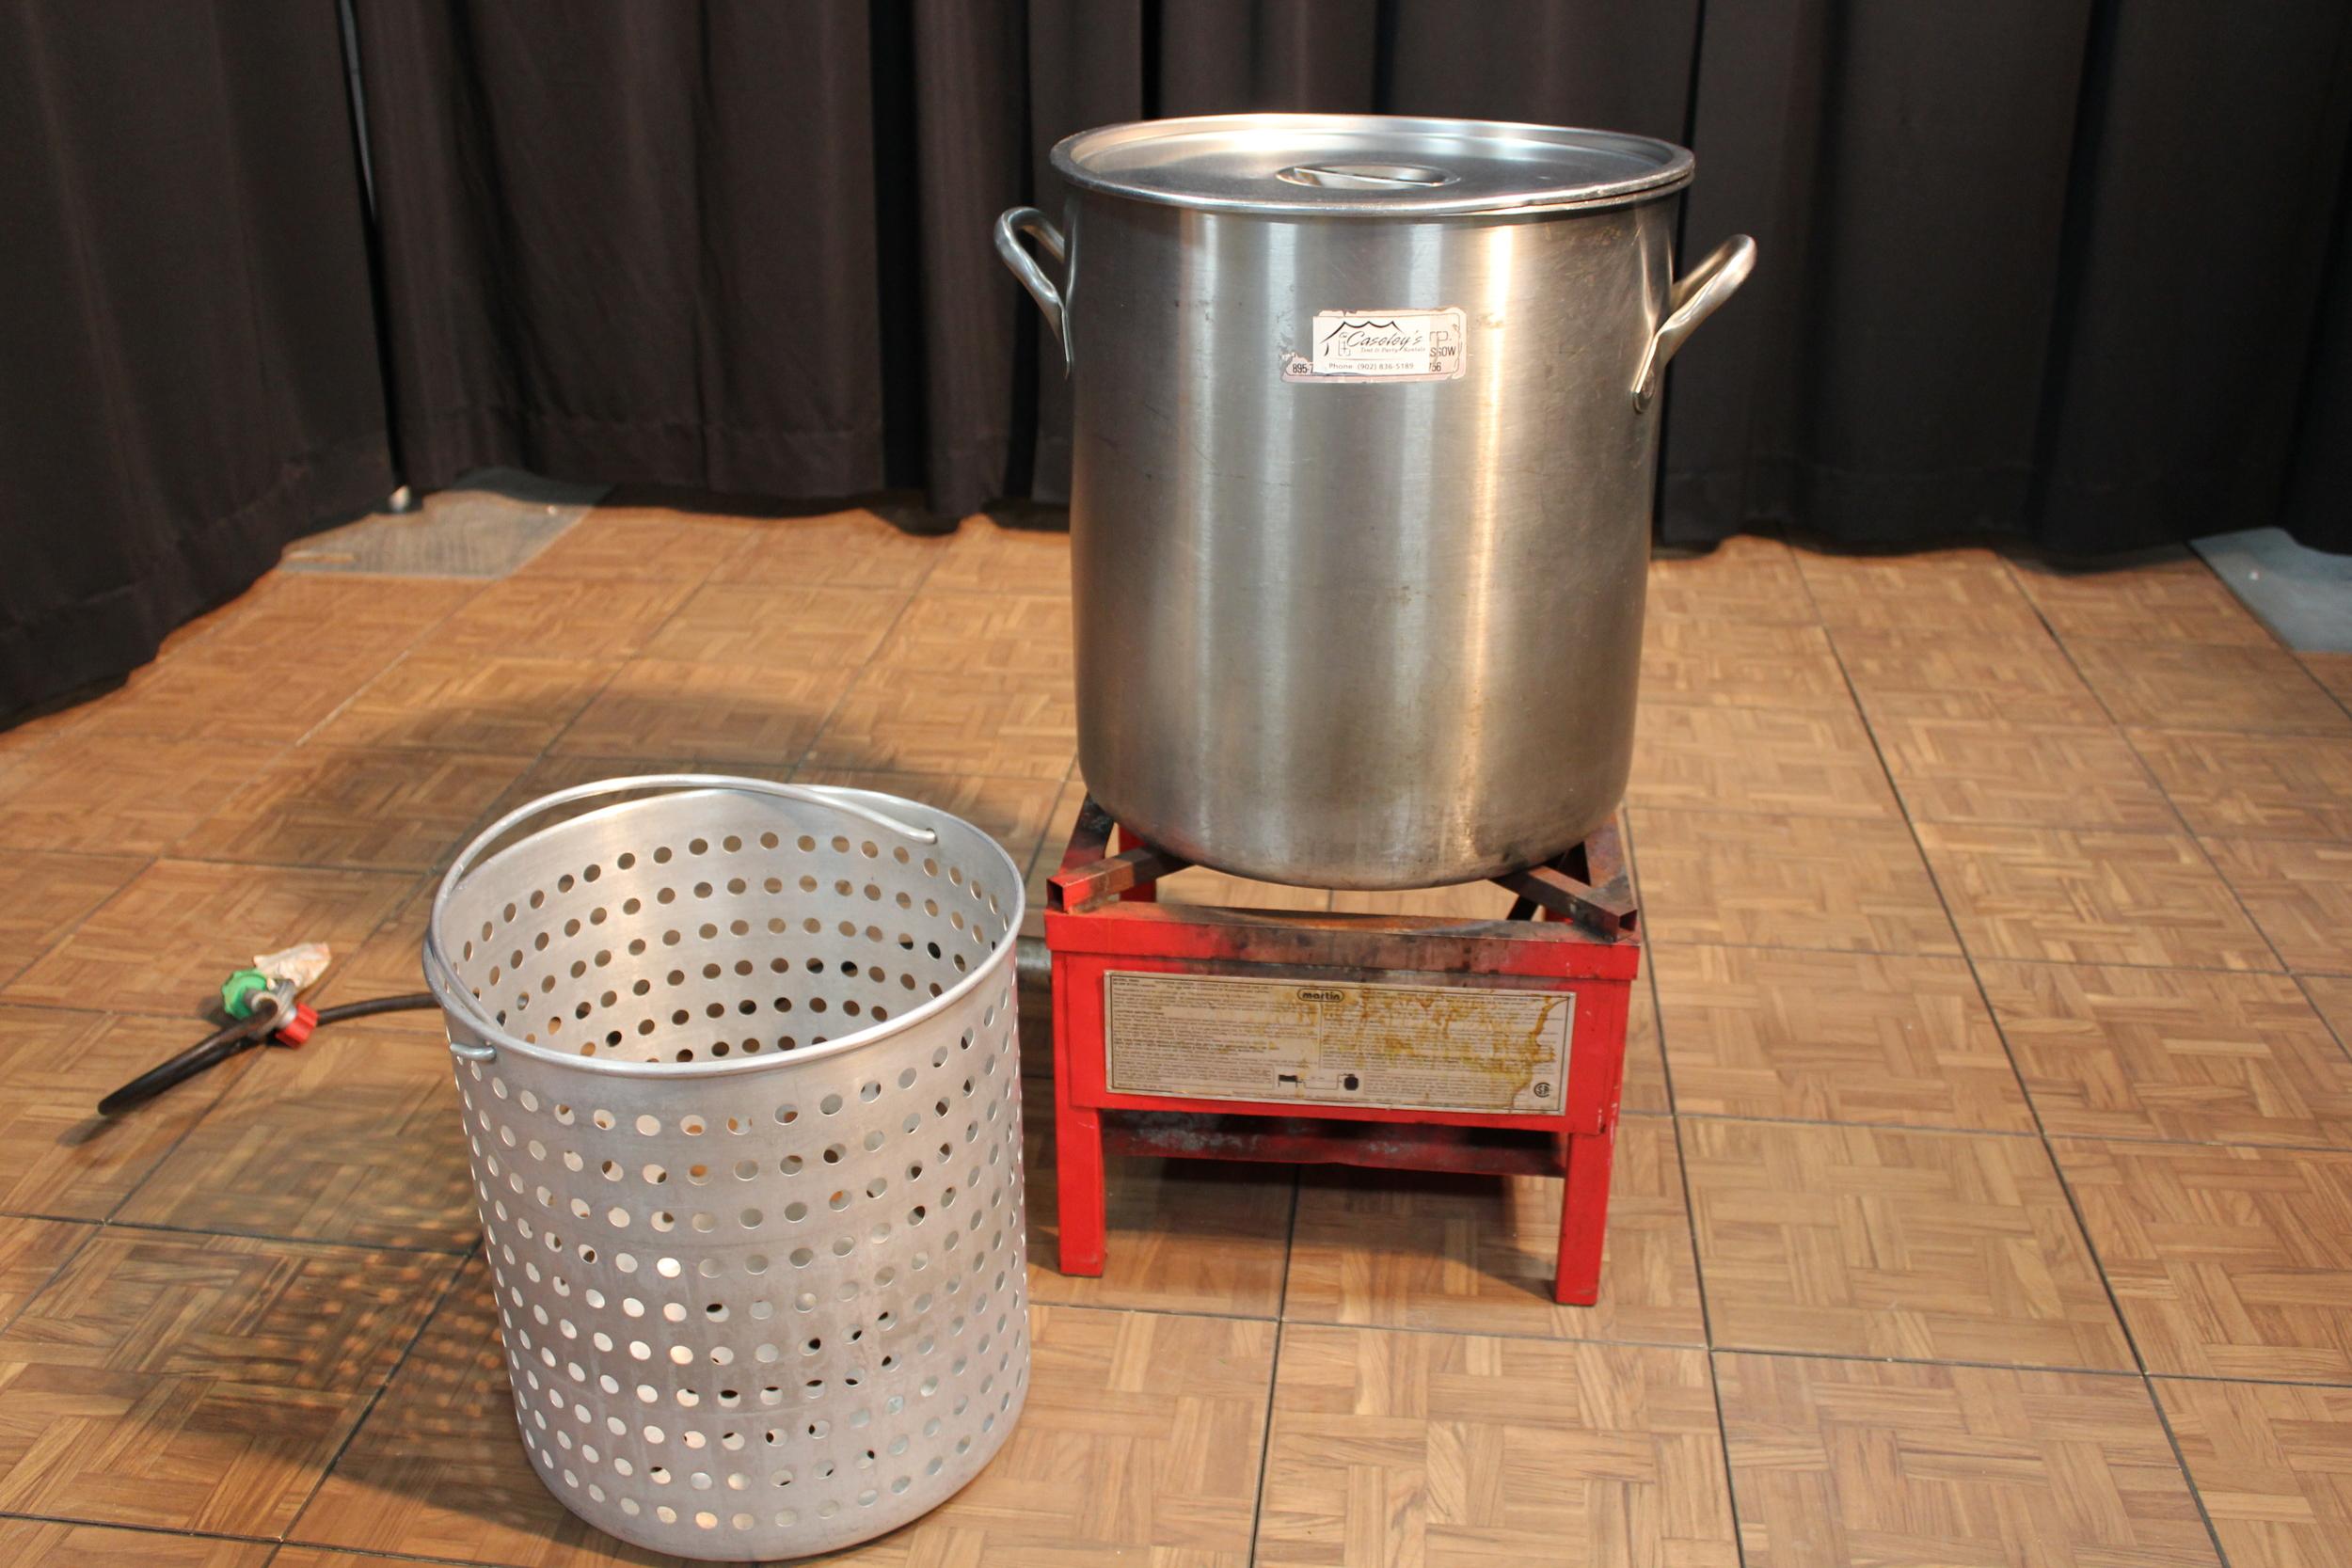 Propane Cooker $ 30.00  Cooking Pot $ 30.00  Cooking Pot Strainer $ 30.00  Propane Tanks - 20 lb. $ 35.00